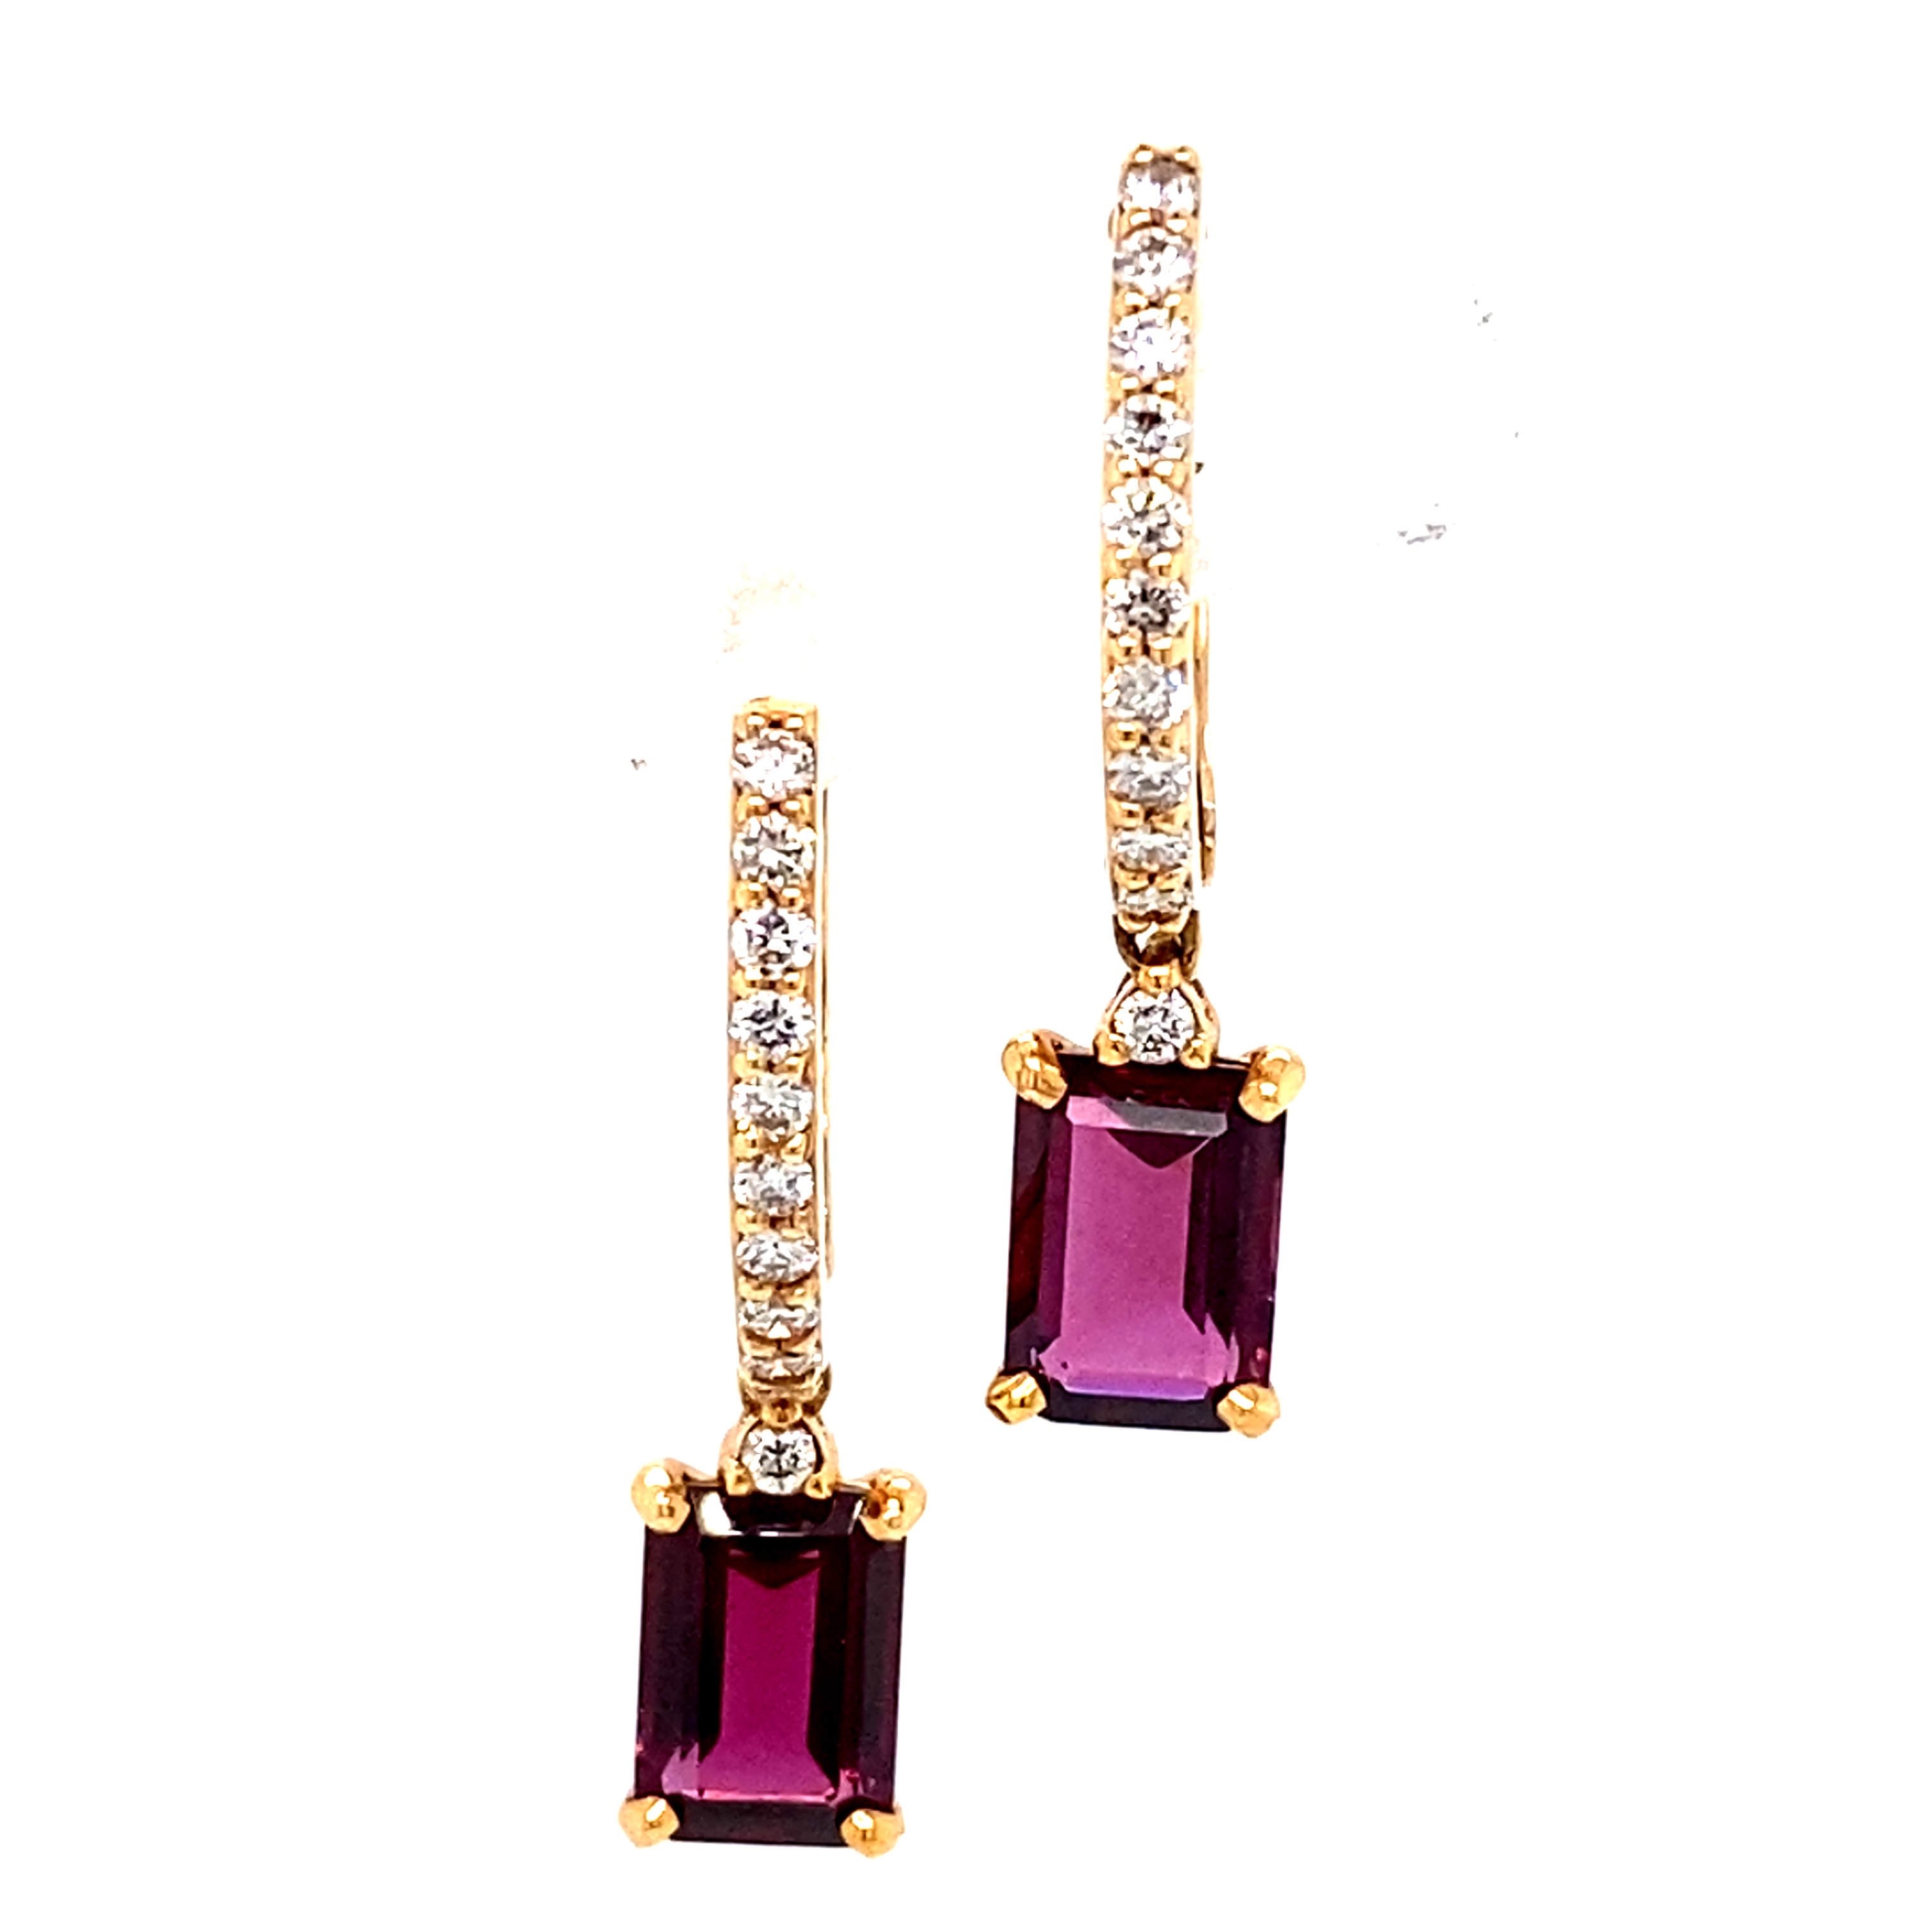 18ct Rose Gold Diamond and Rhodolite Garnet Drop Earrings